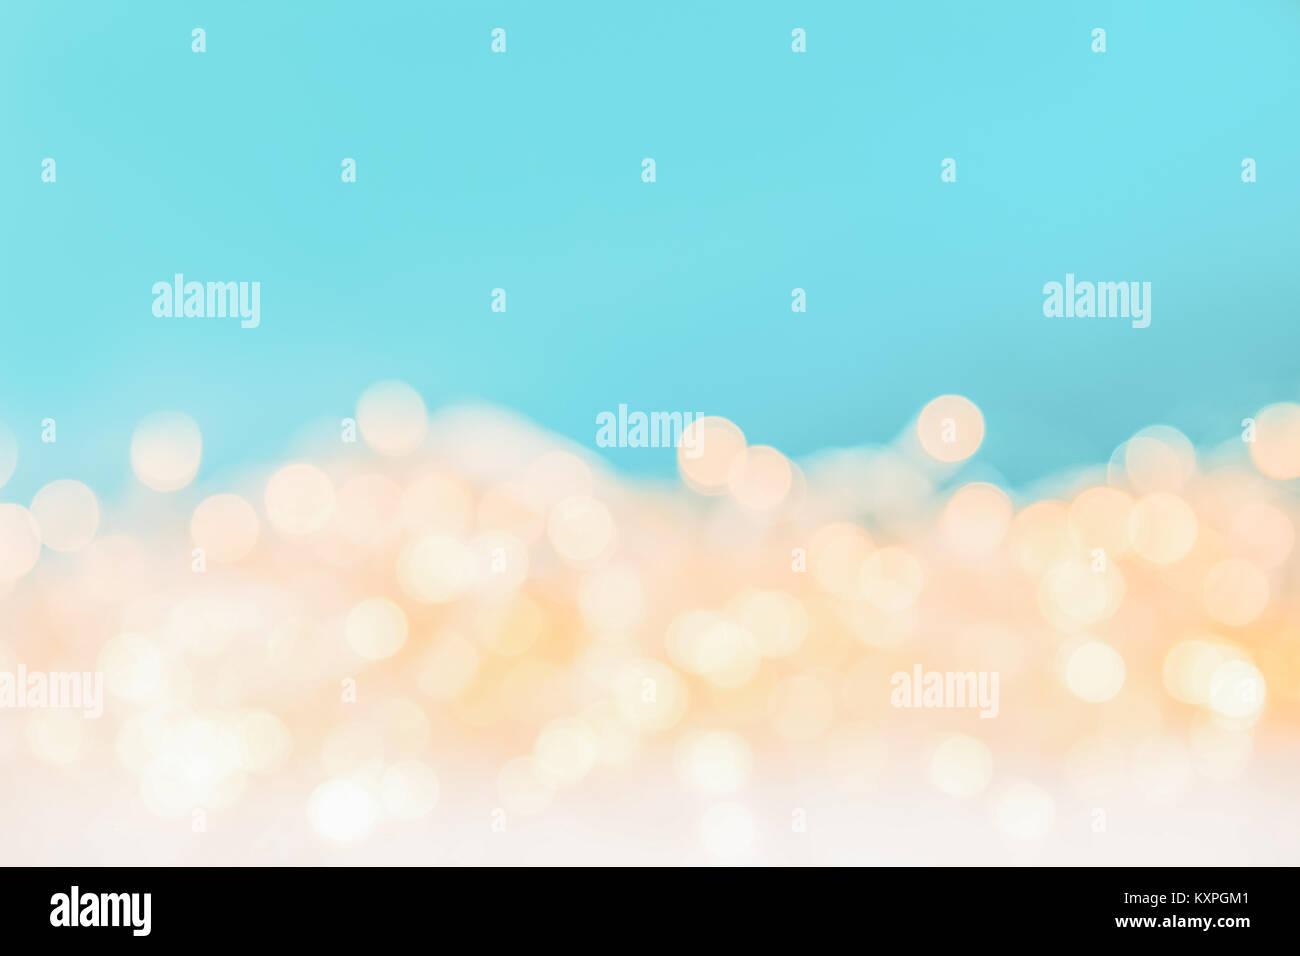 shiny christmas bokeh lights on blue background - Stock Image